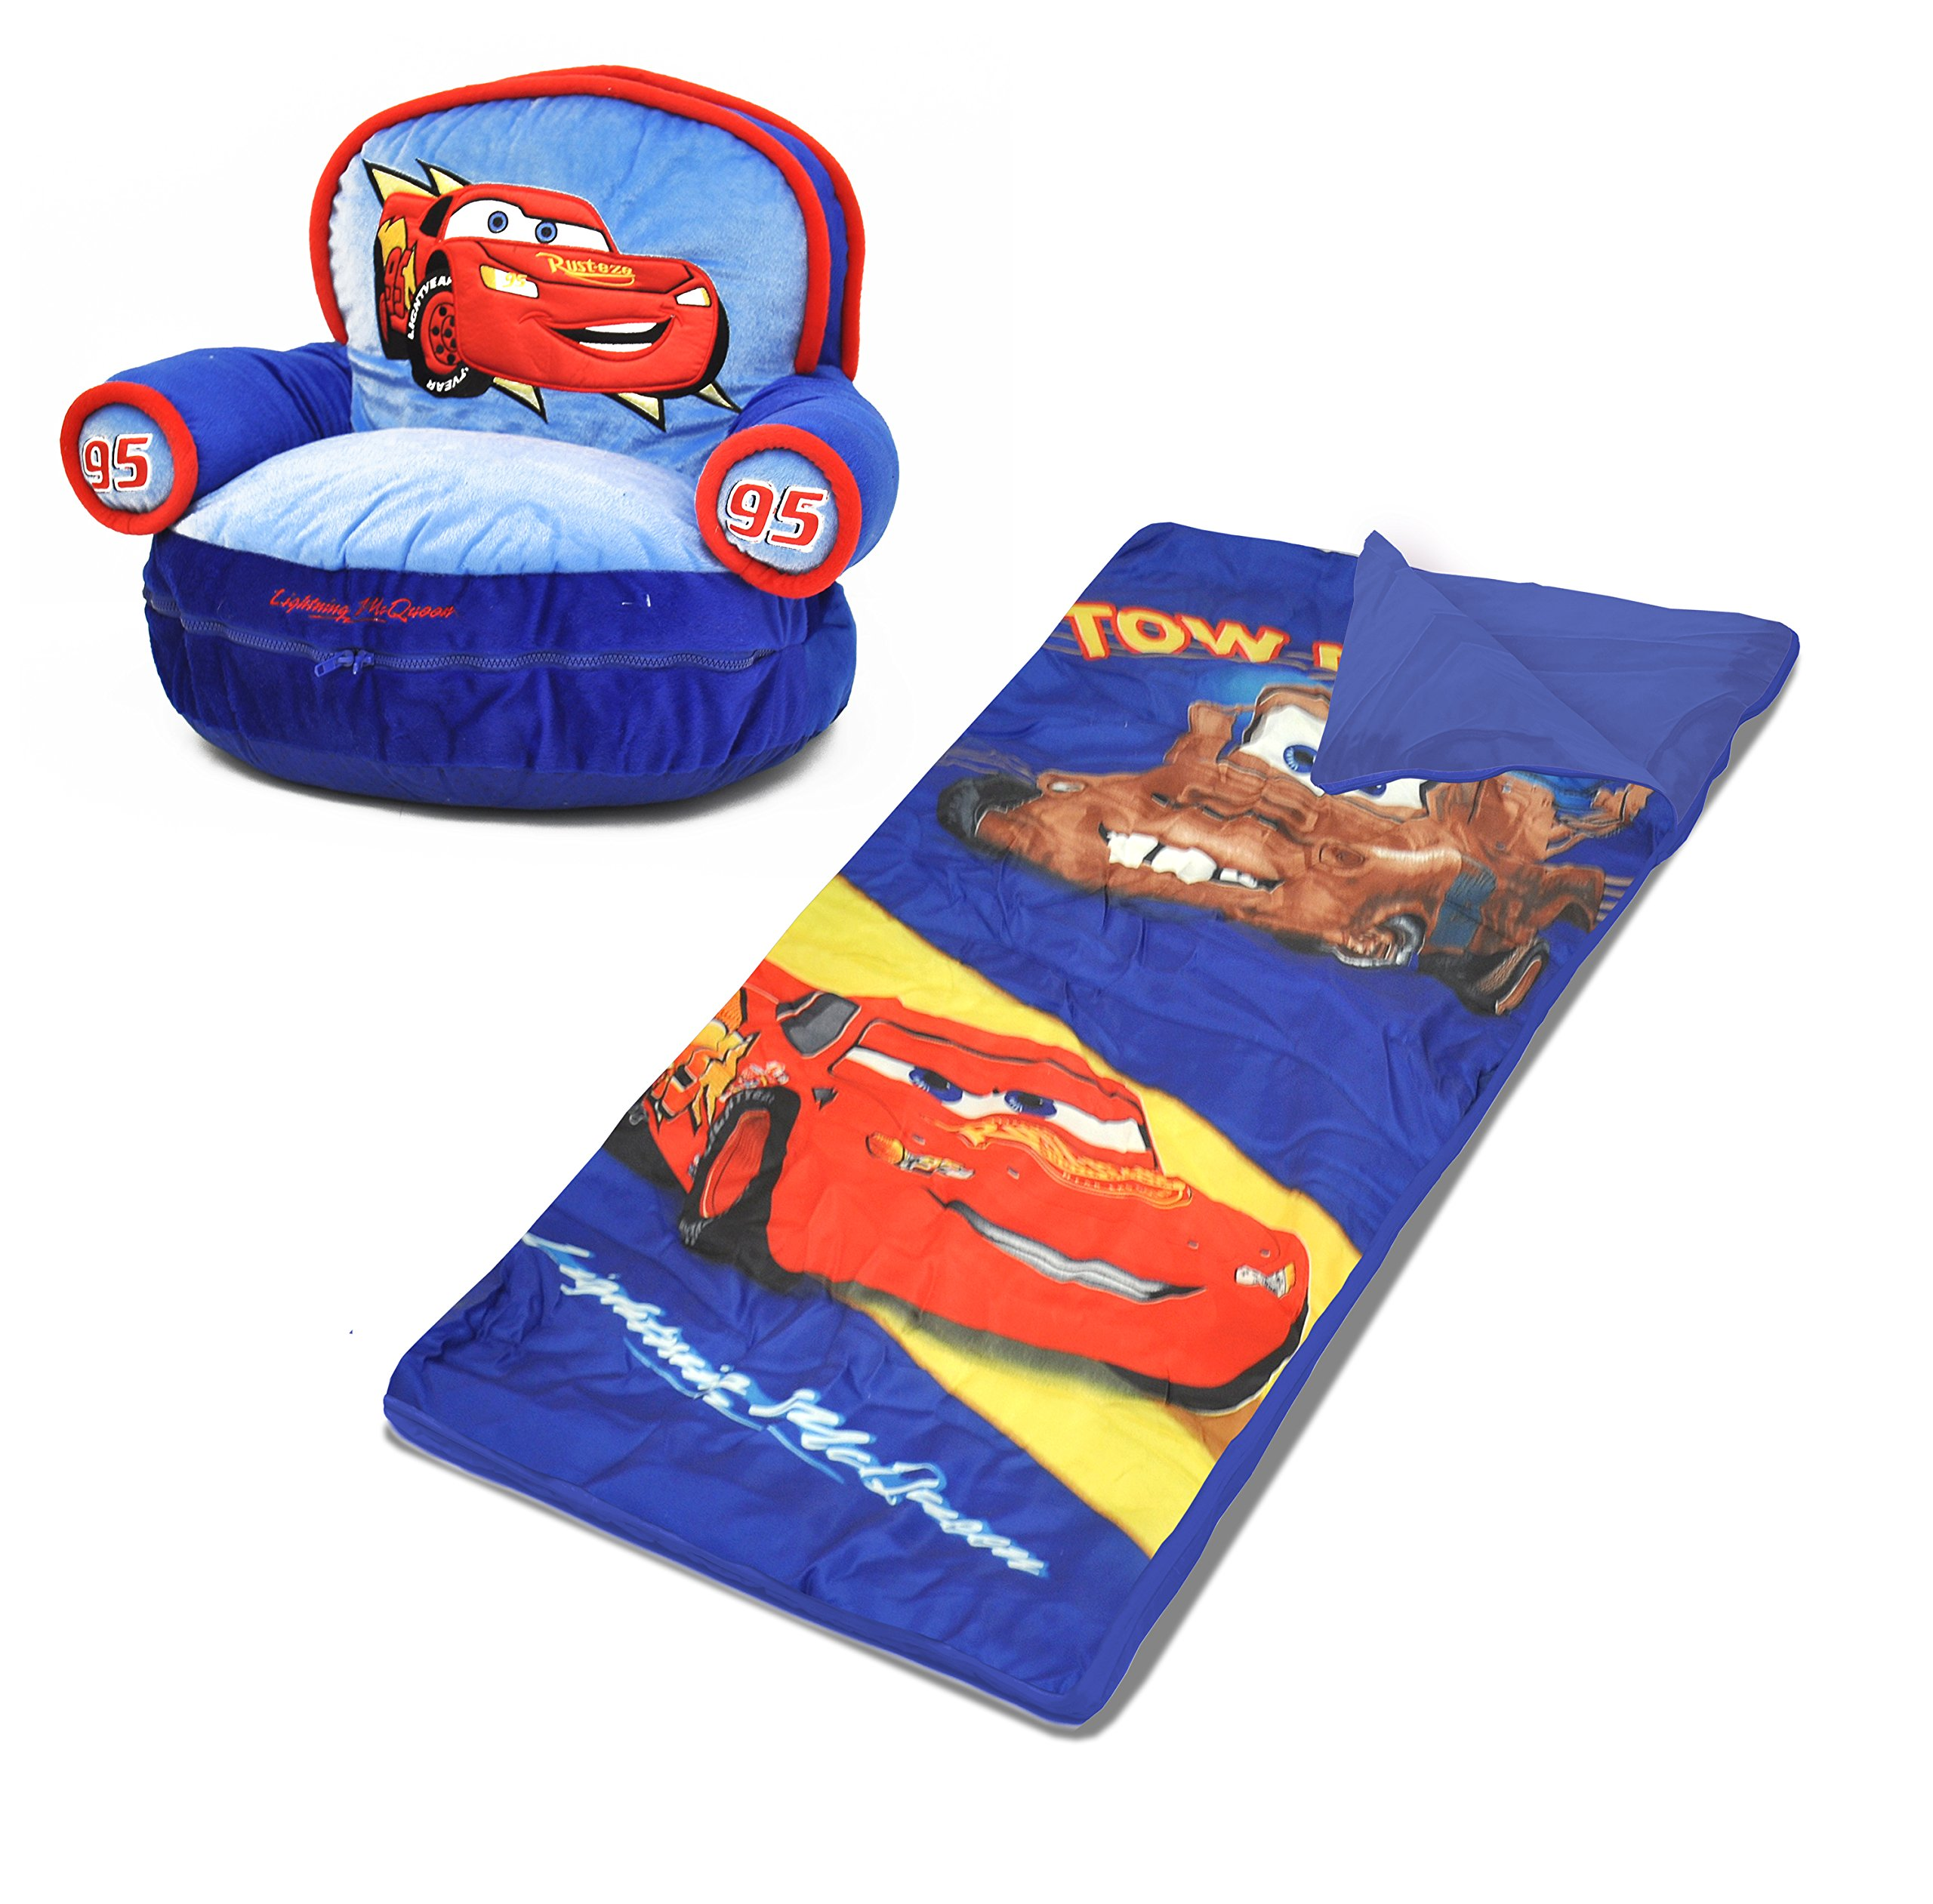 Disney Cars Sofa Chair with Slumber by Disney